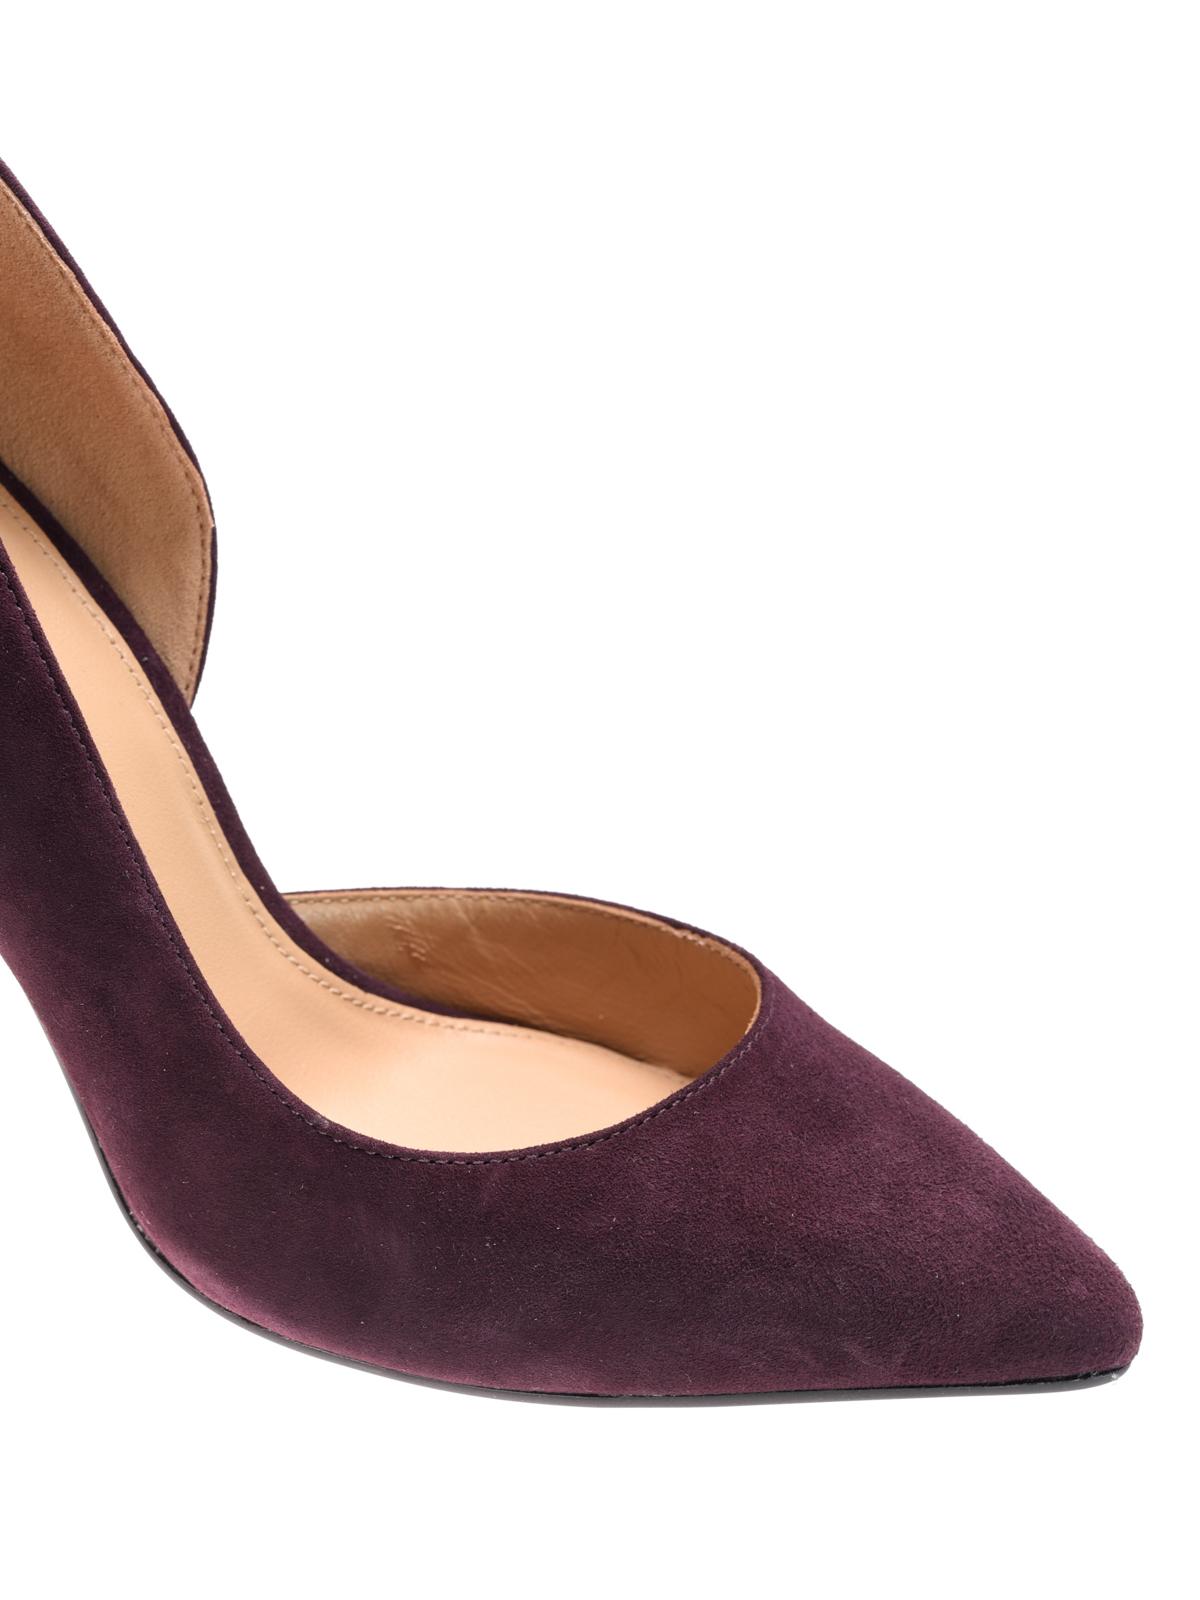 e2e9b22fe5e Michael Kors - Nathalie flex mid pumps - court shoes - 40F6NAHP1S599